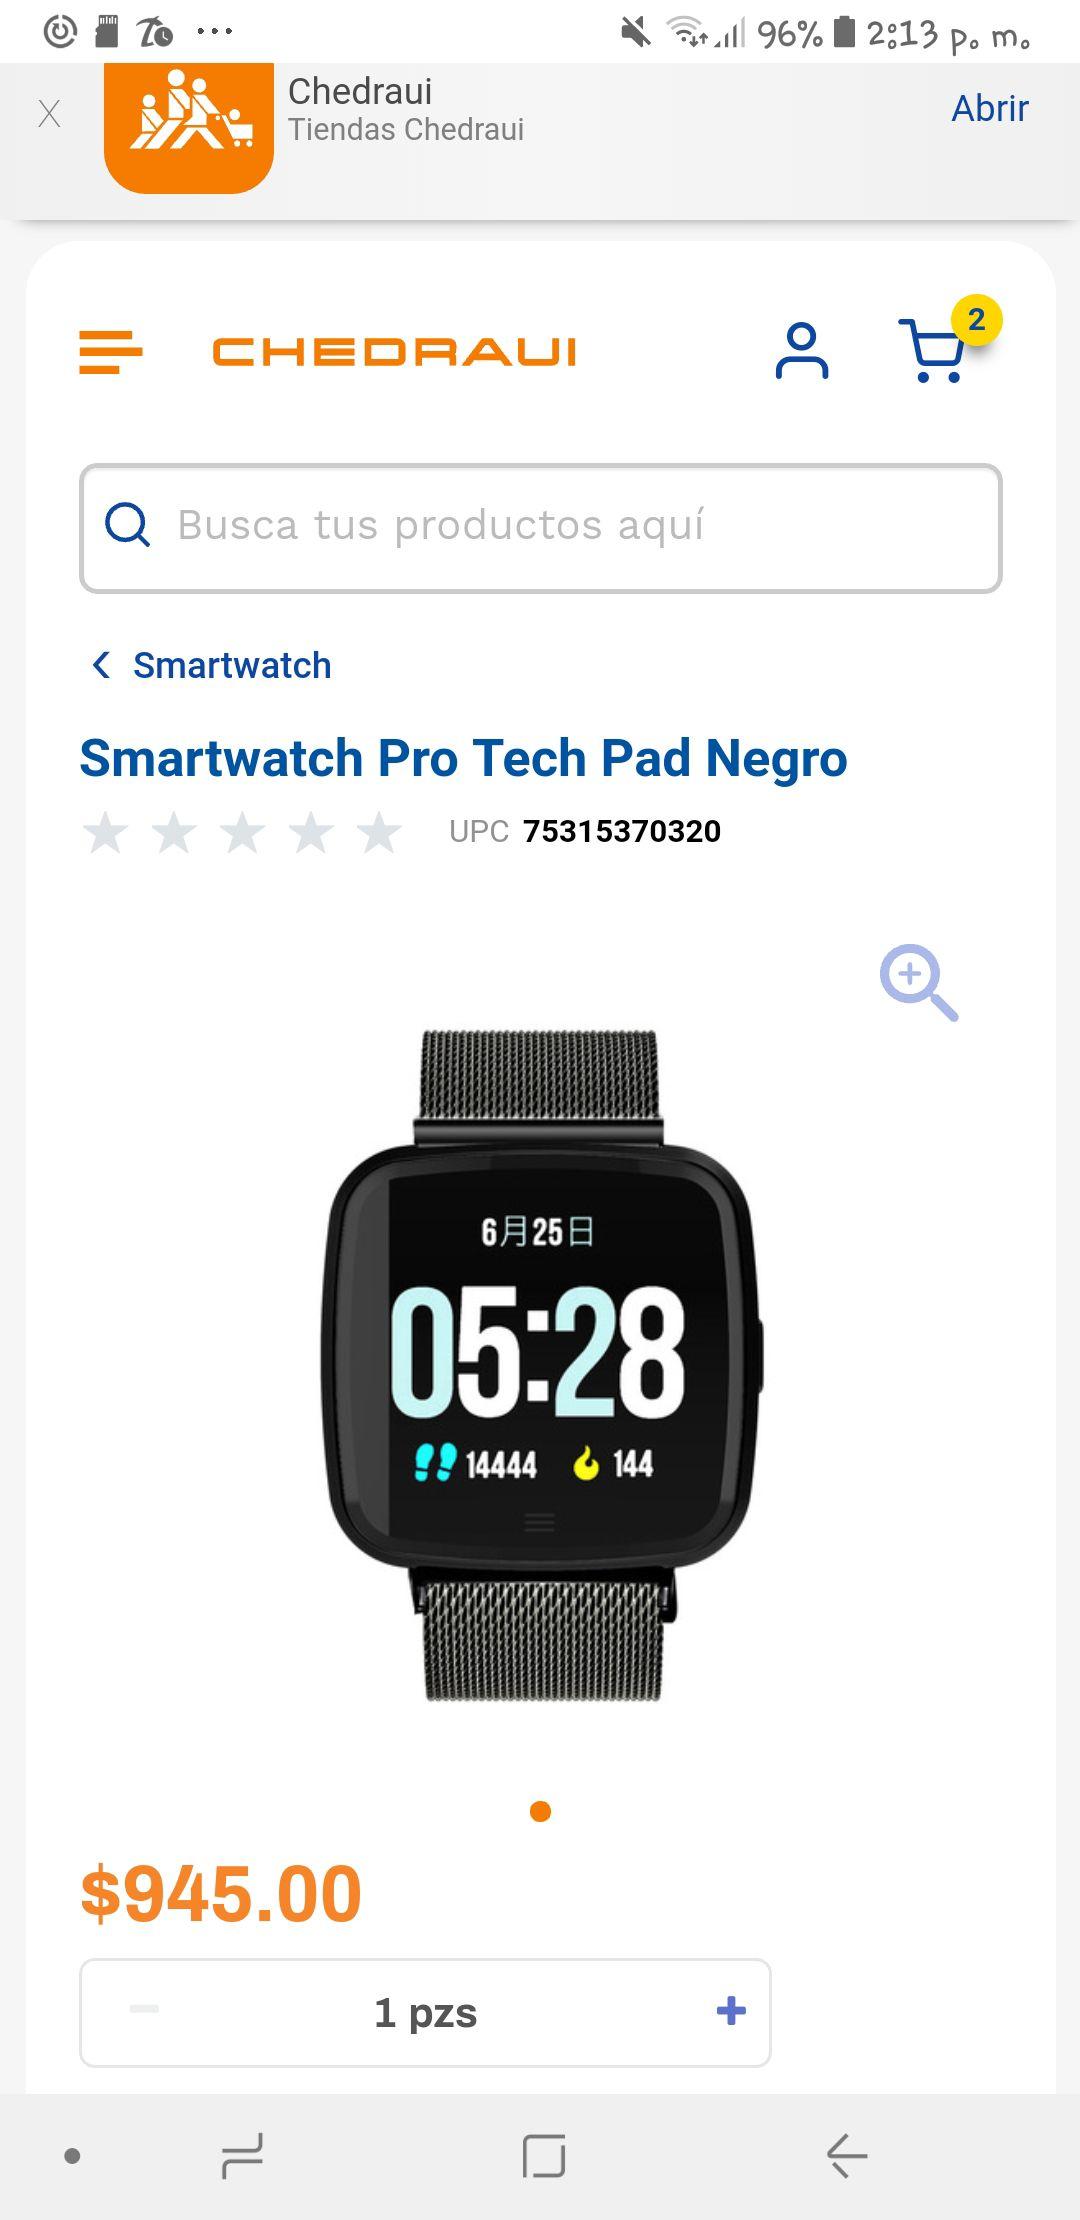 Chedraui: Smartwatch tech pad